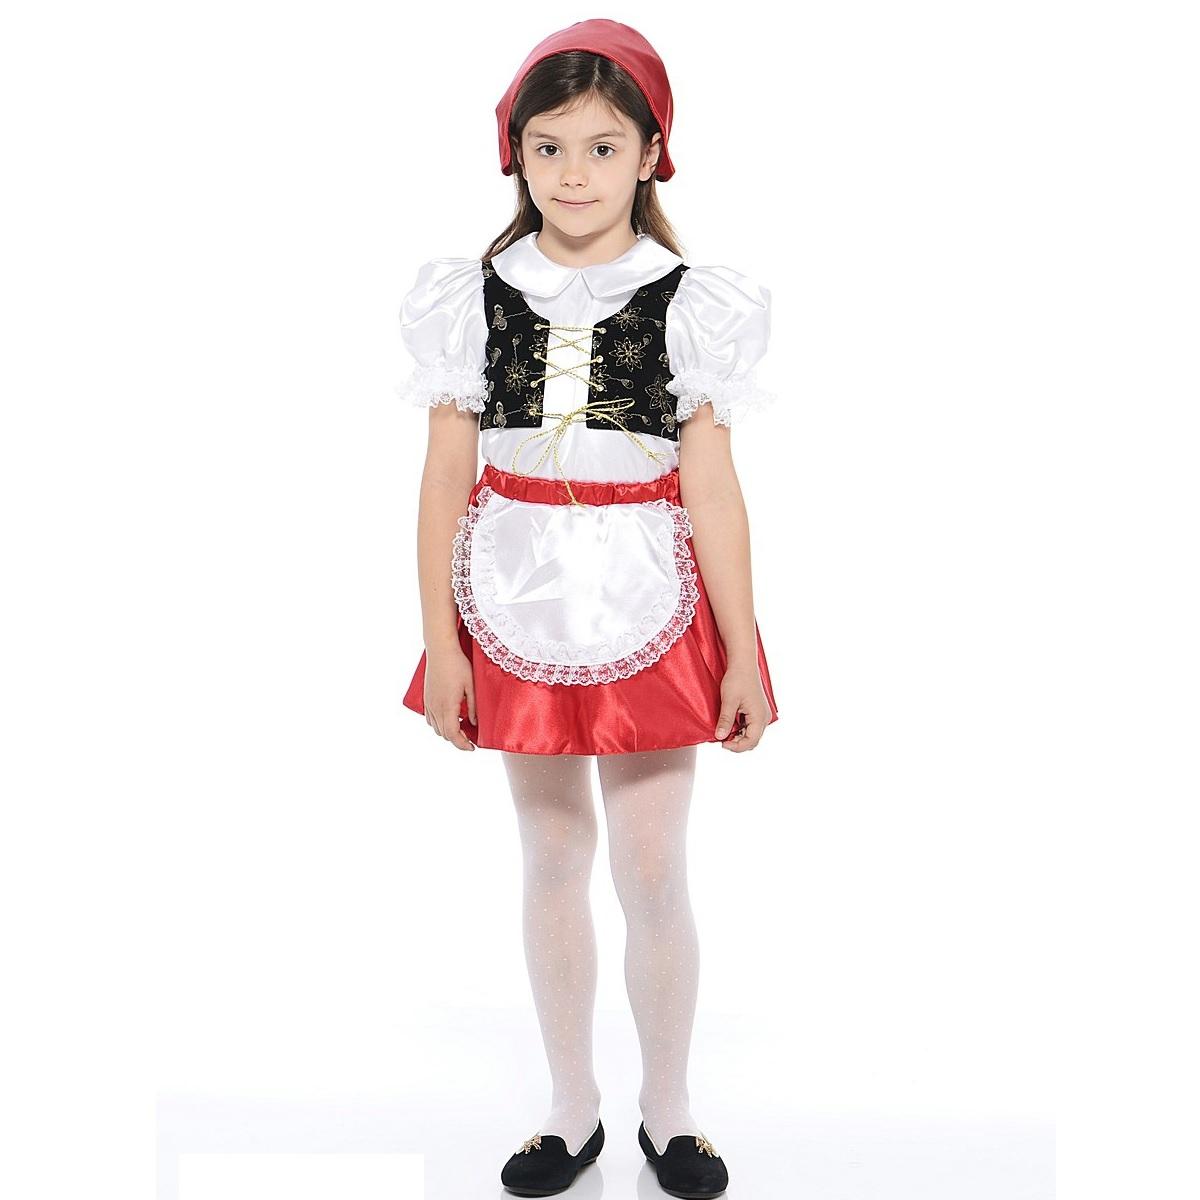 Карнавальный костюм – Красная шапочка, размер 26Карнавальные костюмы<br>Карнавальный костюм – Красная шапочка, размер 26<br>